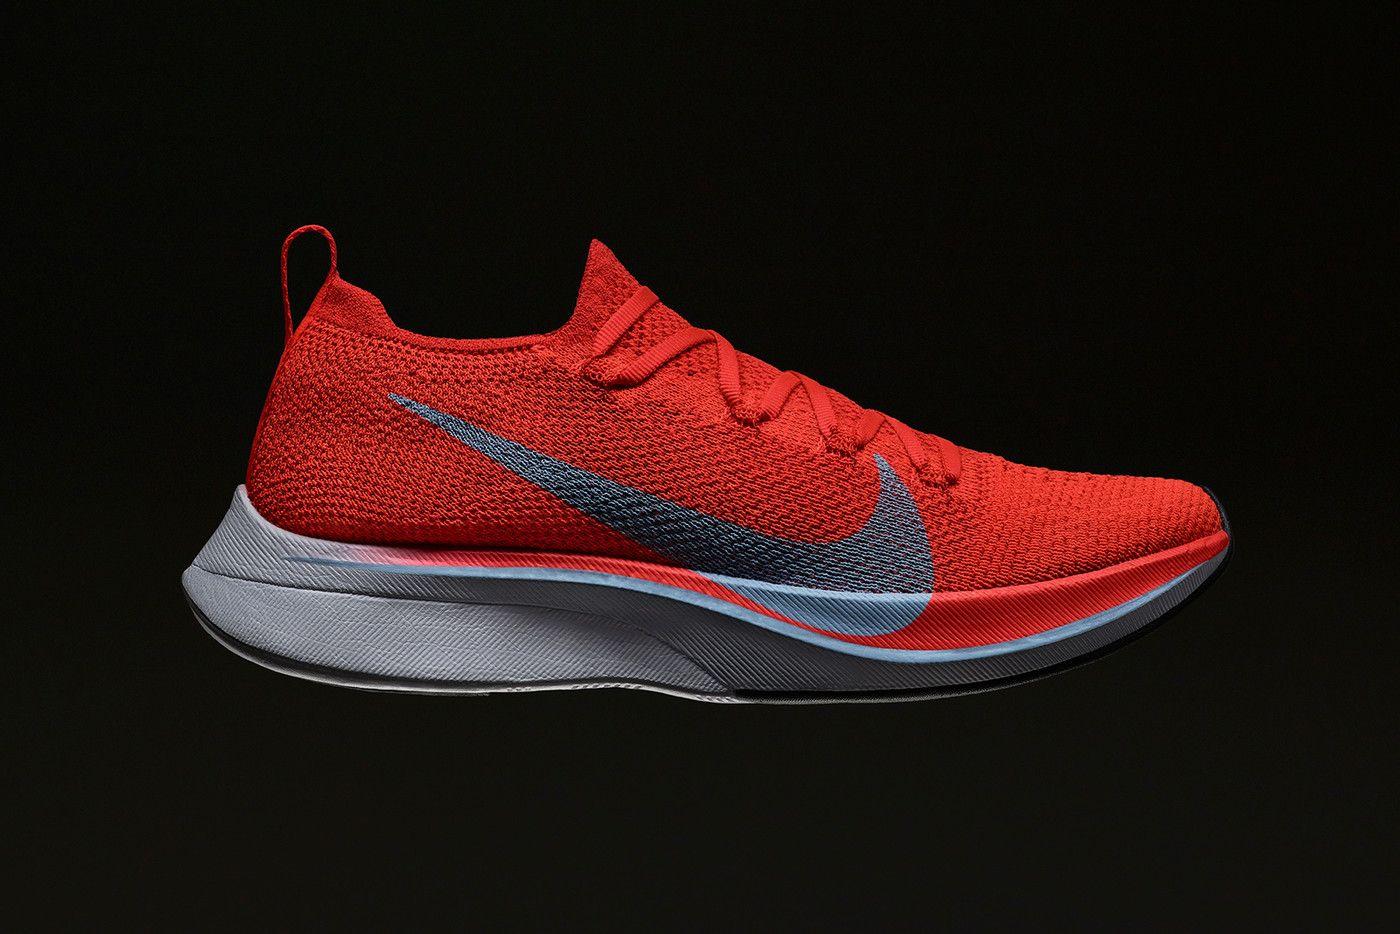 Nike Updates Zoom Fly Vaporfly 4 Runners For Marathon Season Nike Zoom Nike Shoes Maroon Nike Shoes Roshe